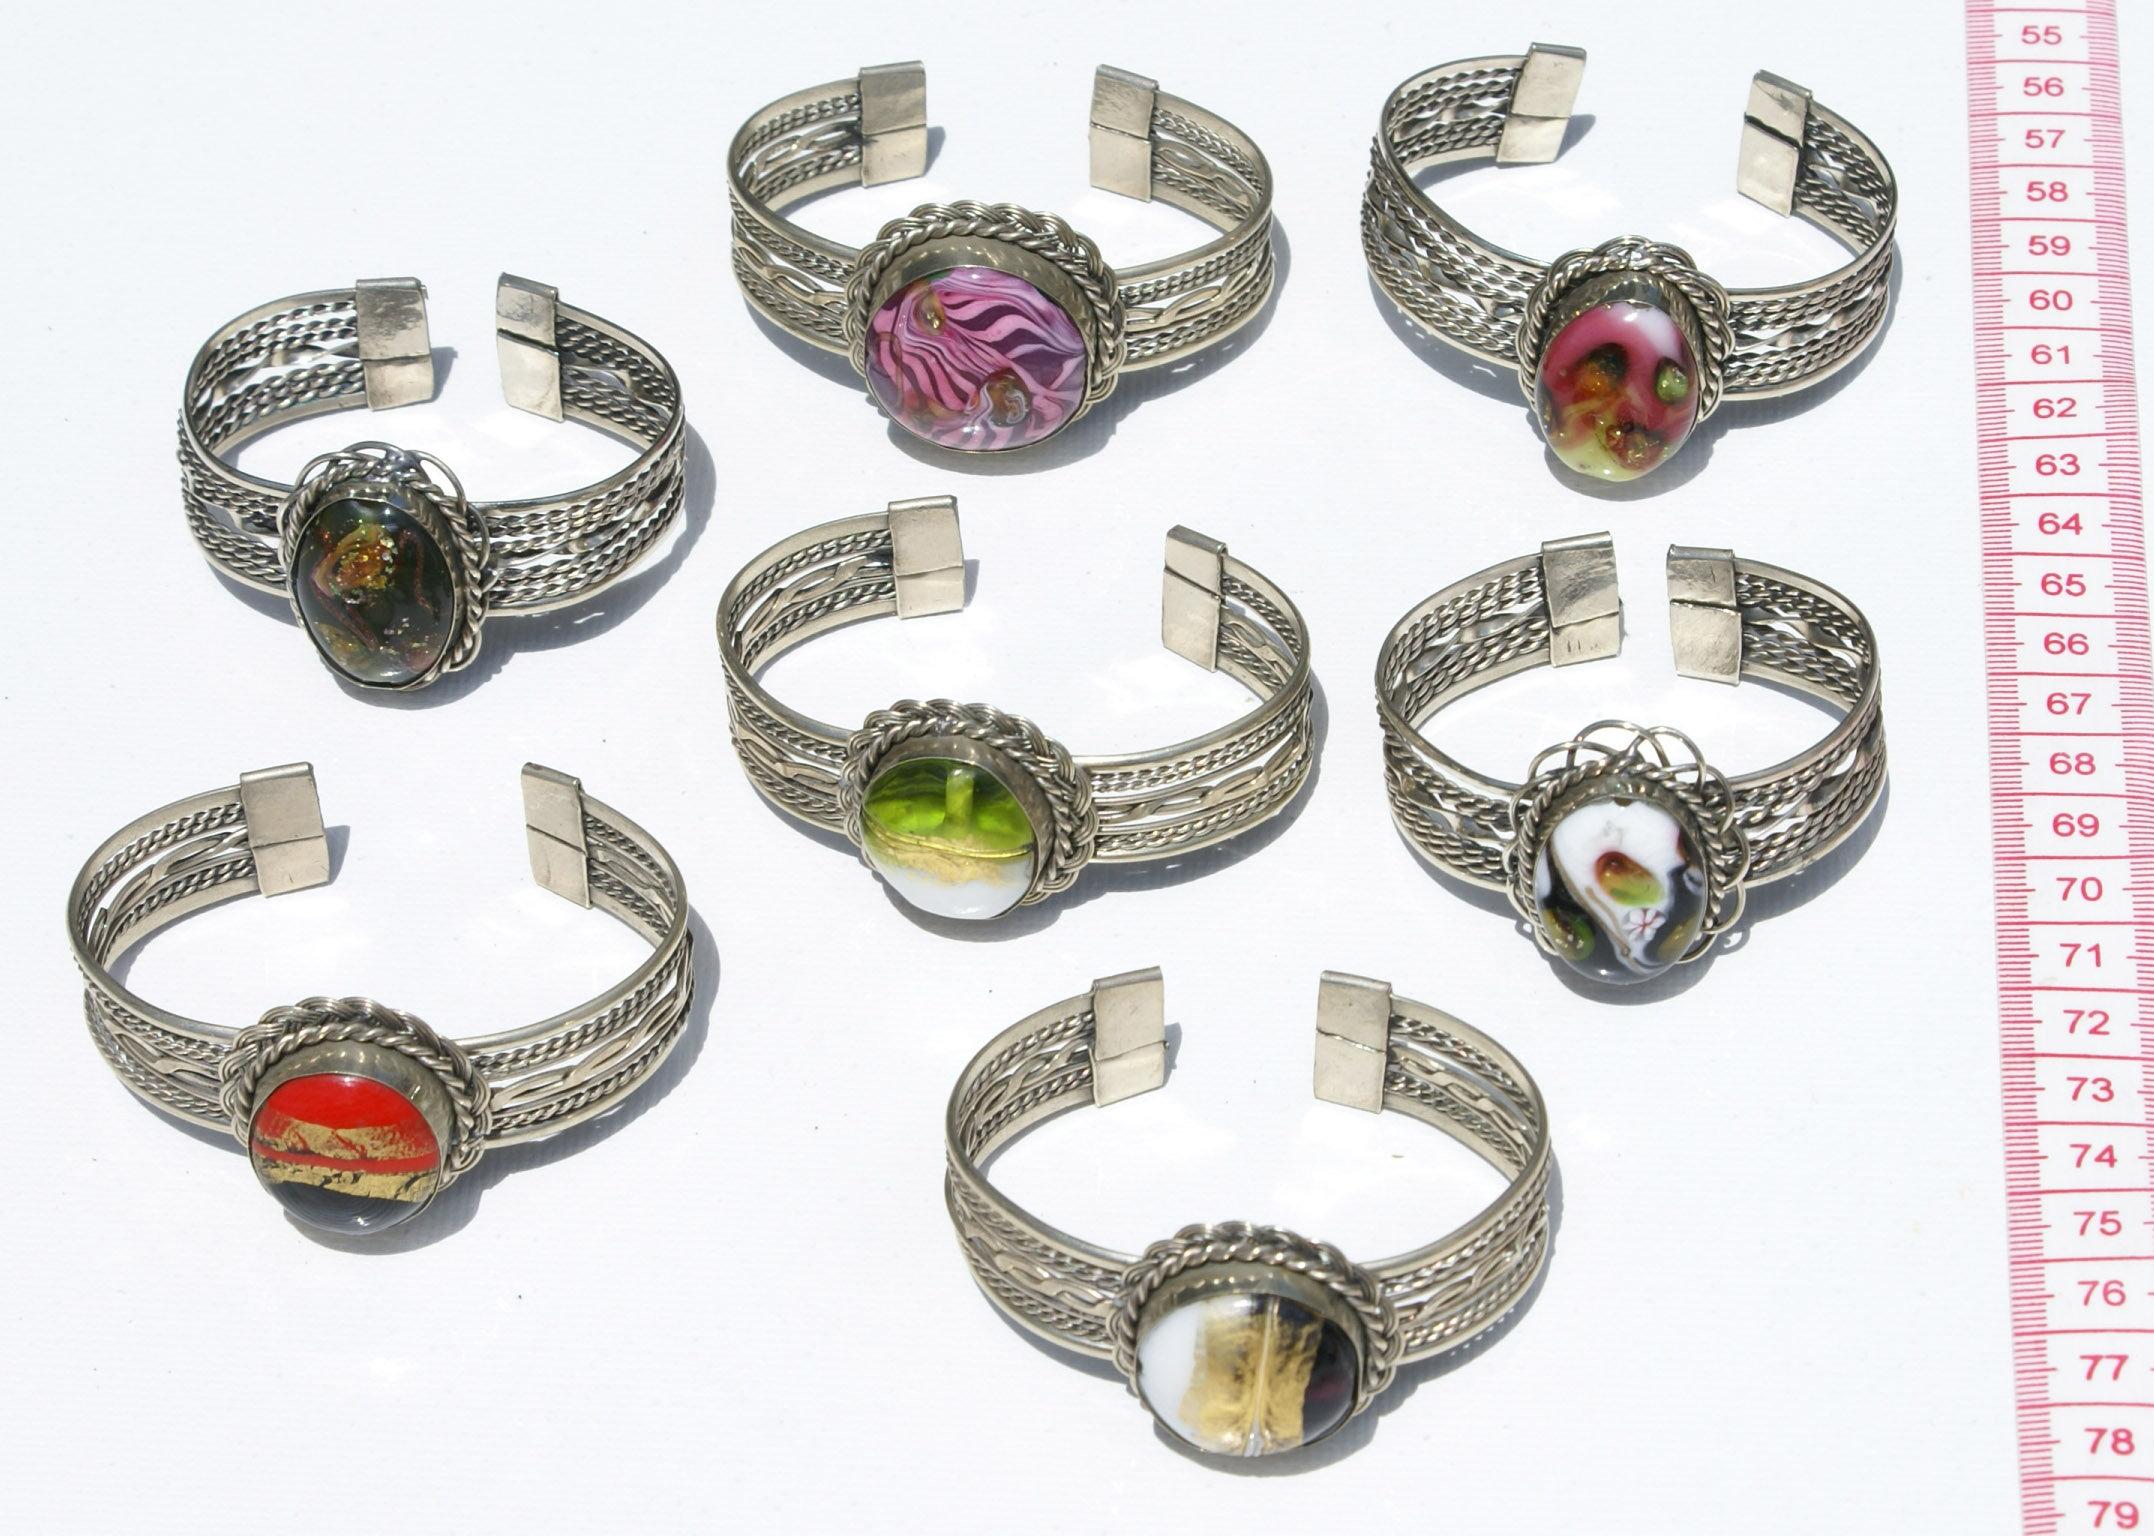 Lot 5 βραχιόλια βραχιολιών μανσετών εθνική περού πέτρες φθηνά κοσμήματα  πώληση 7a4140029b8